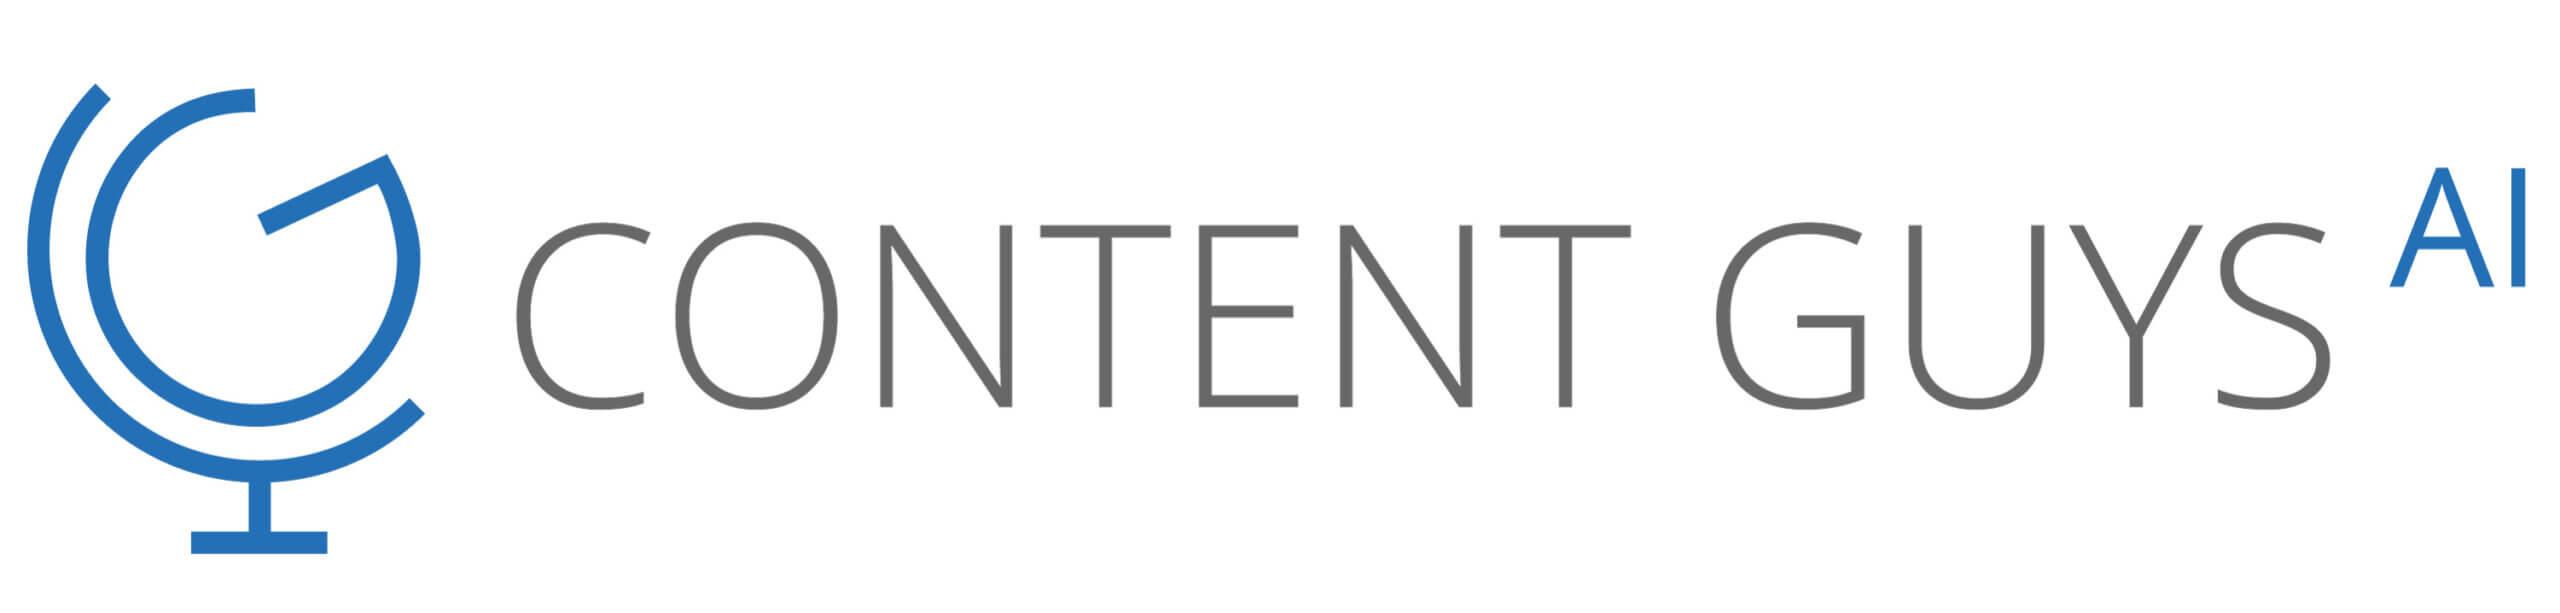 content_guys_ai_logo